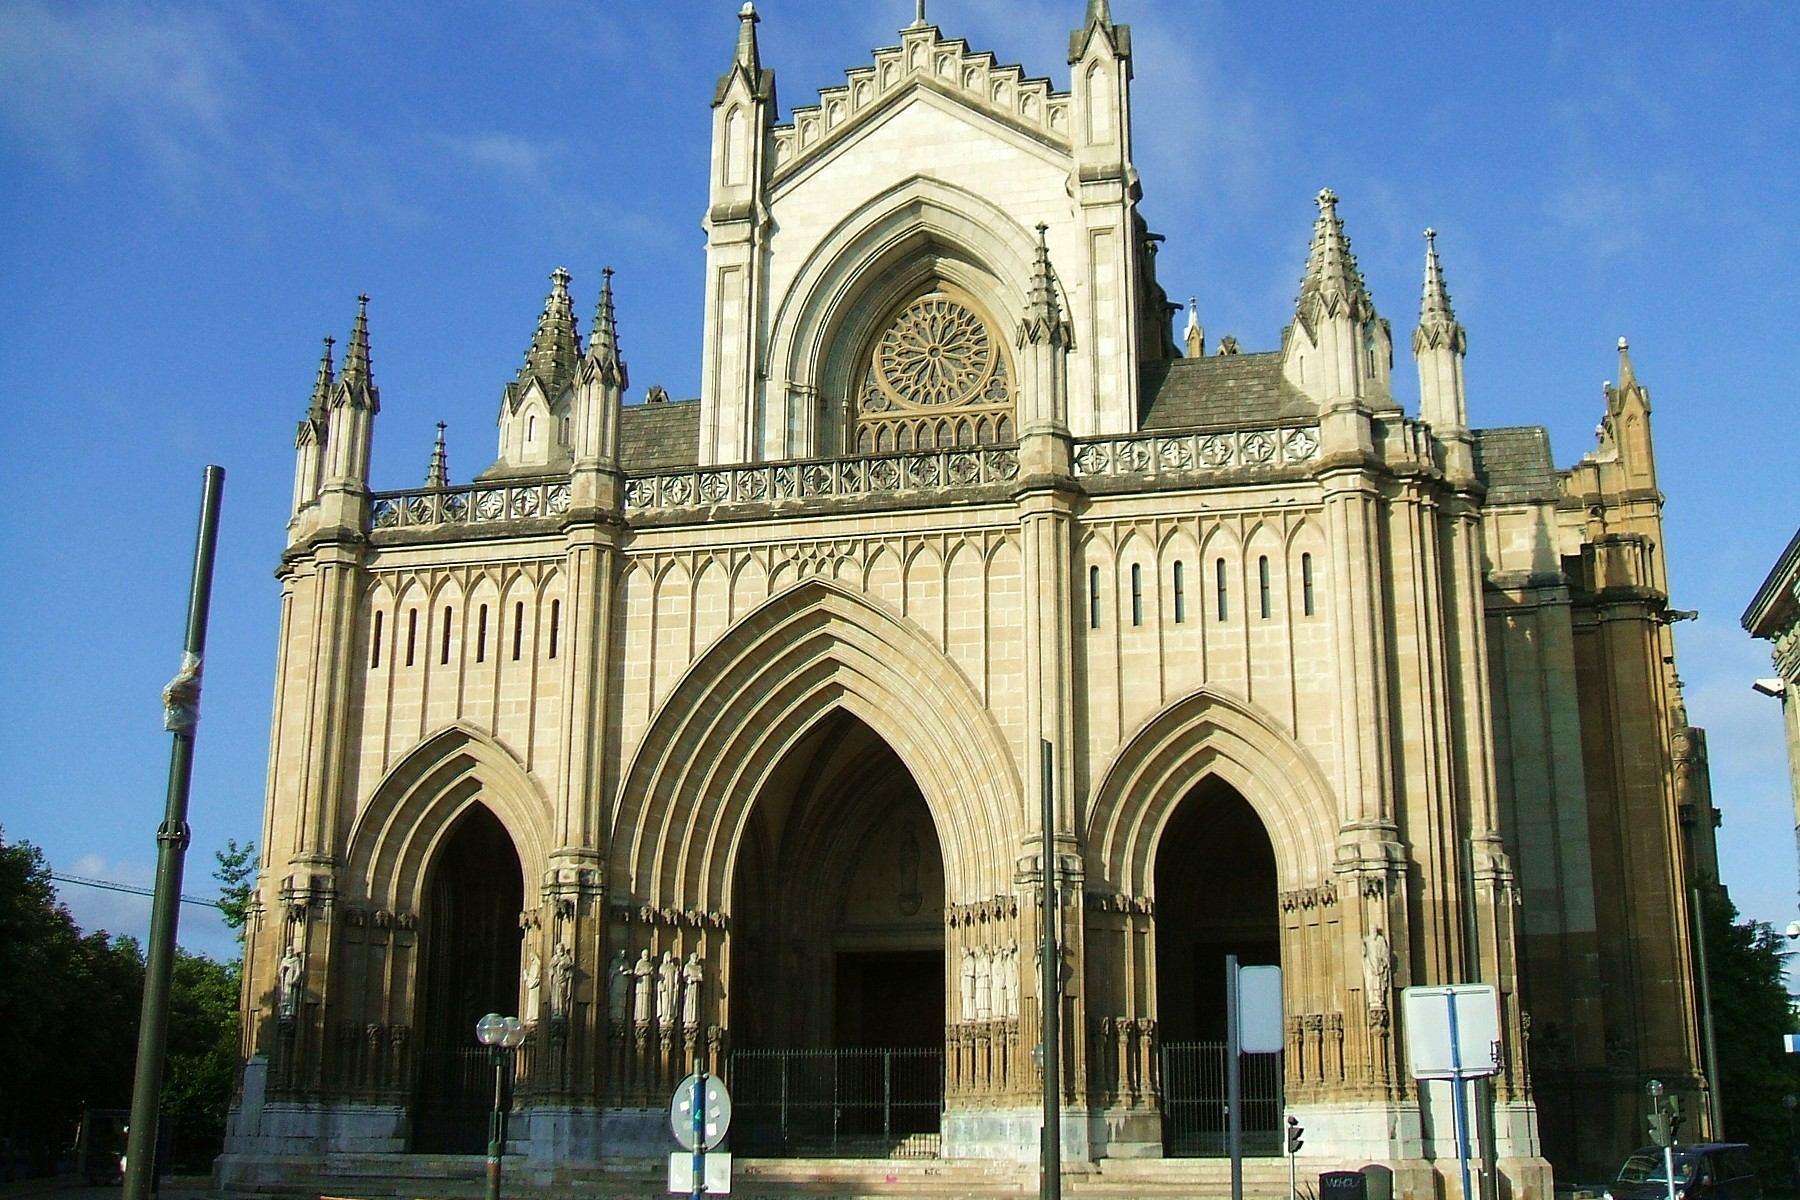 Fitxategi vitoria catedra nueva 0000 jpg wikipedia - Arquitectura pais vasco ...